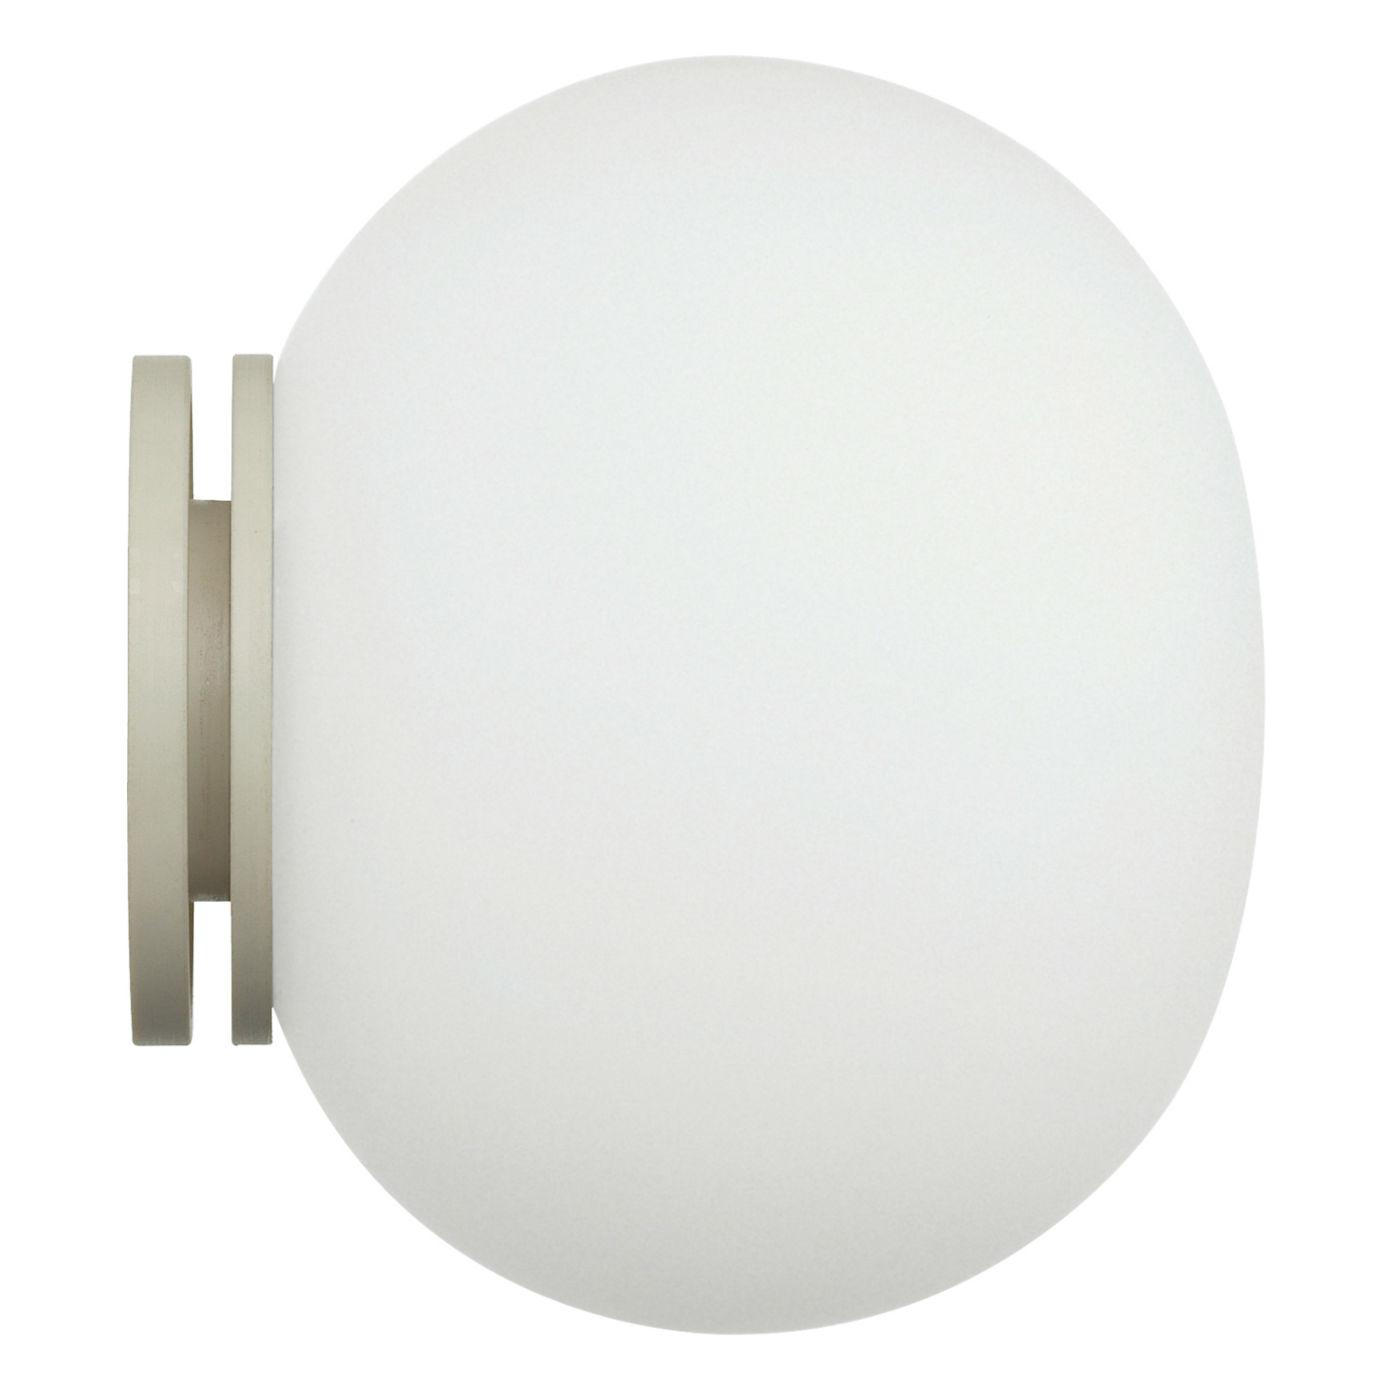 Flos Glo Ball Mini CW Wall Lampceiling Lamp F4190009